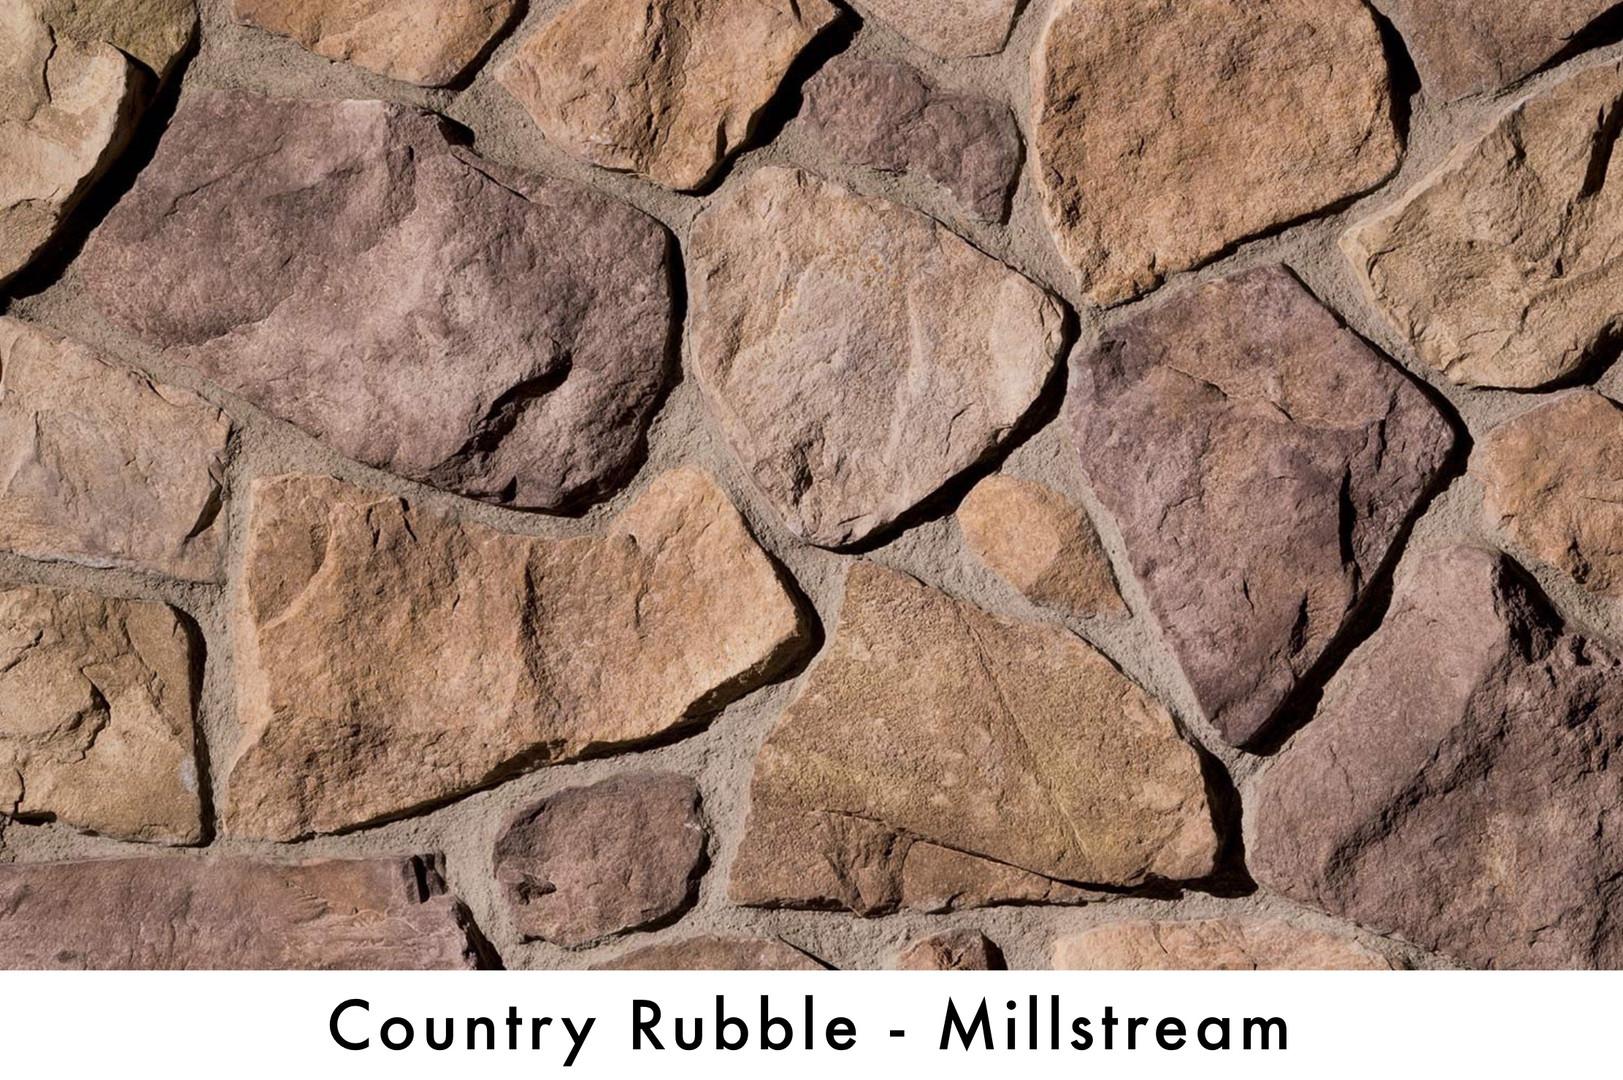 CountryRubble - Millstream